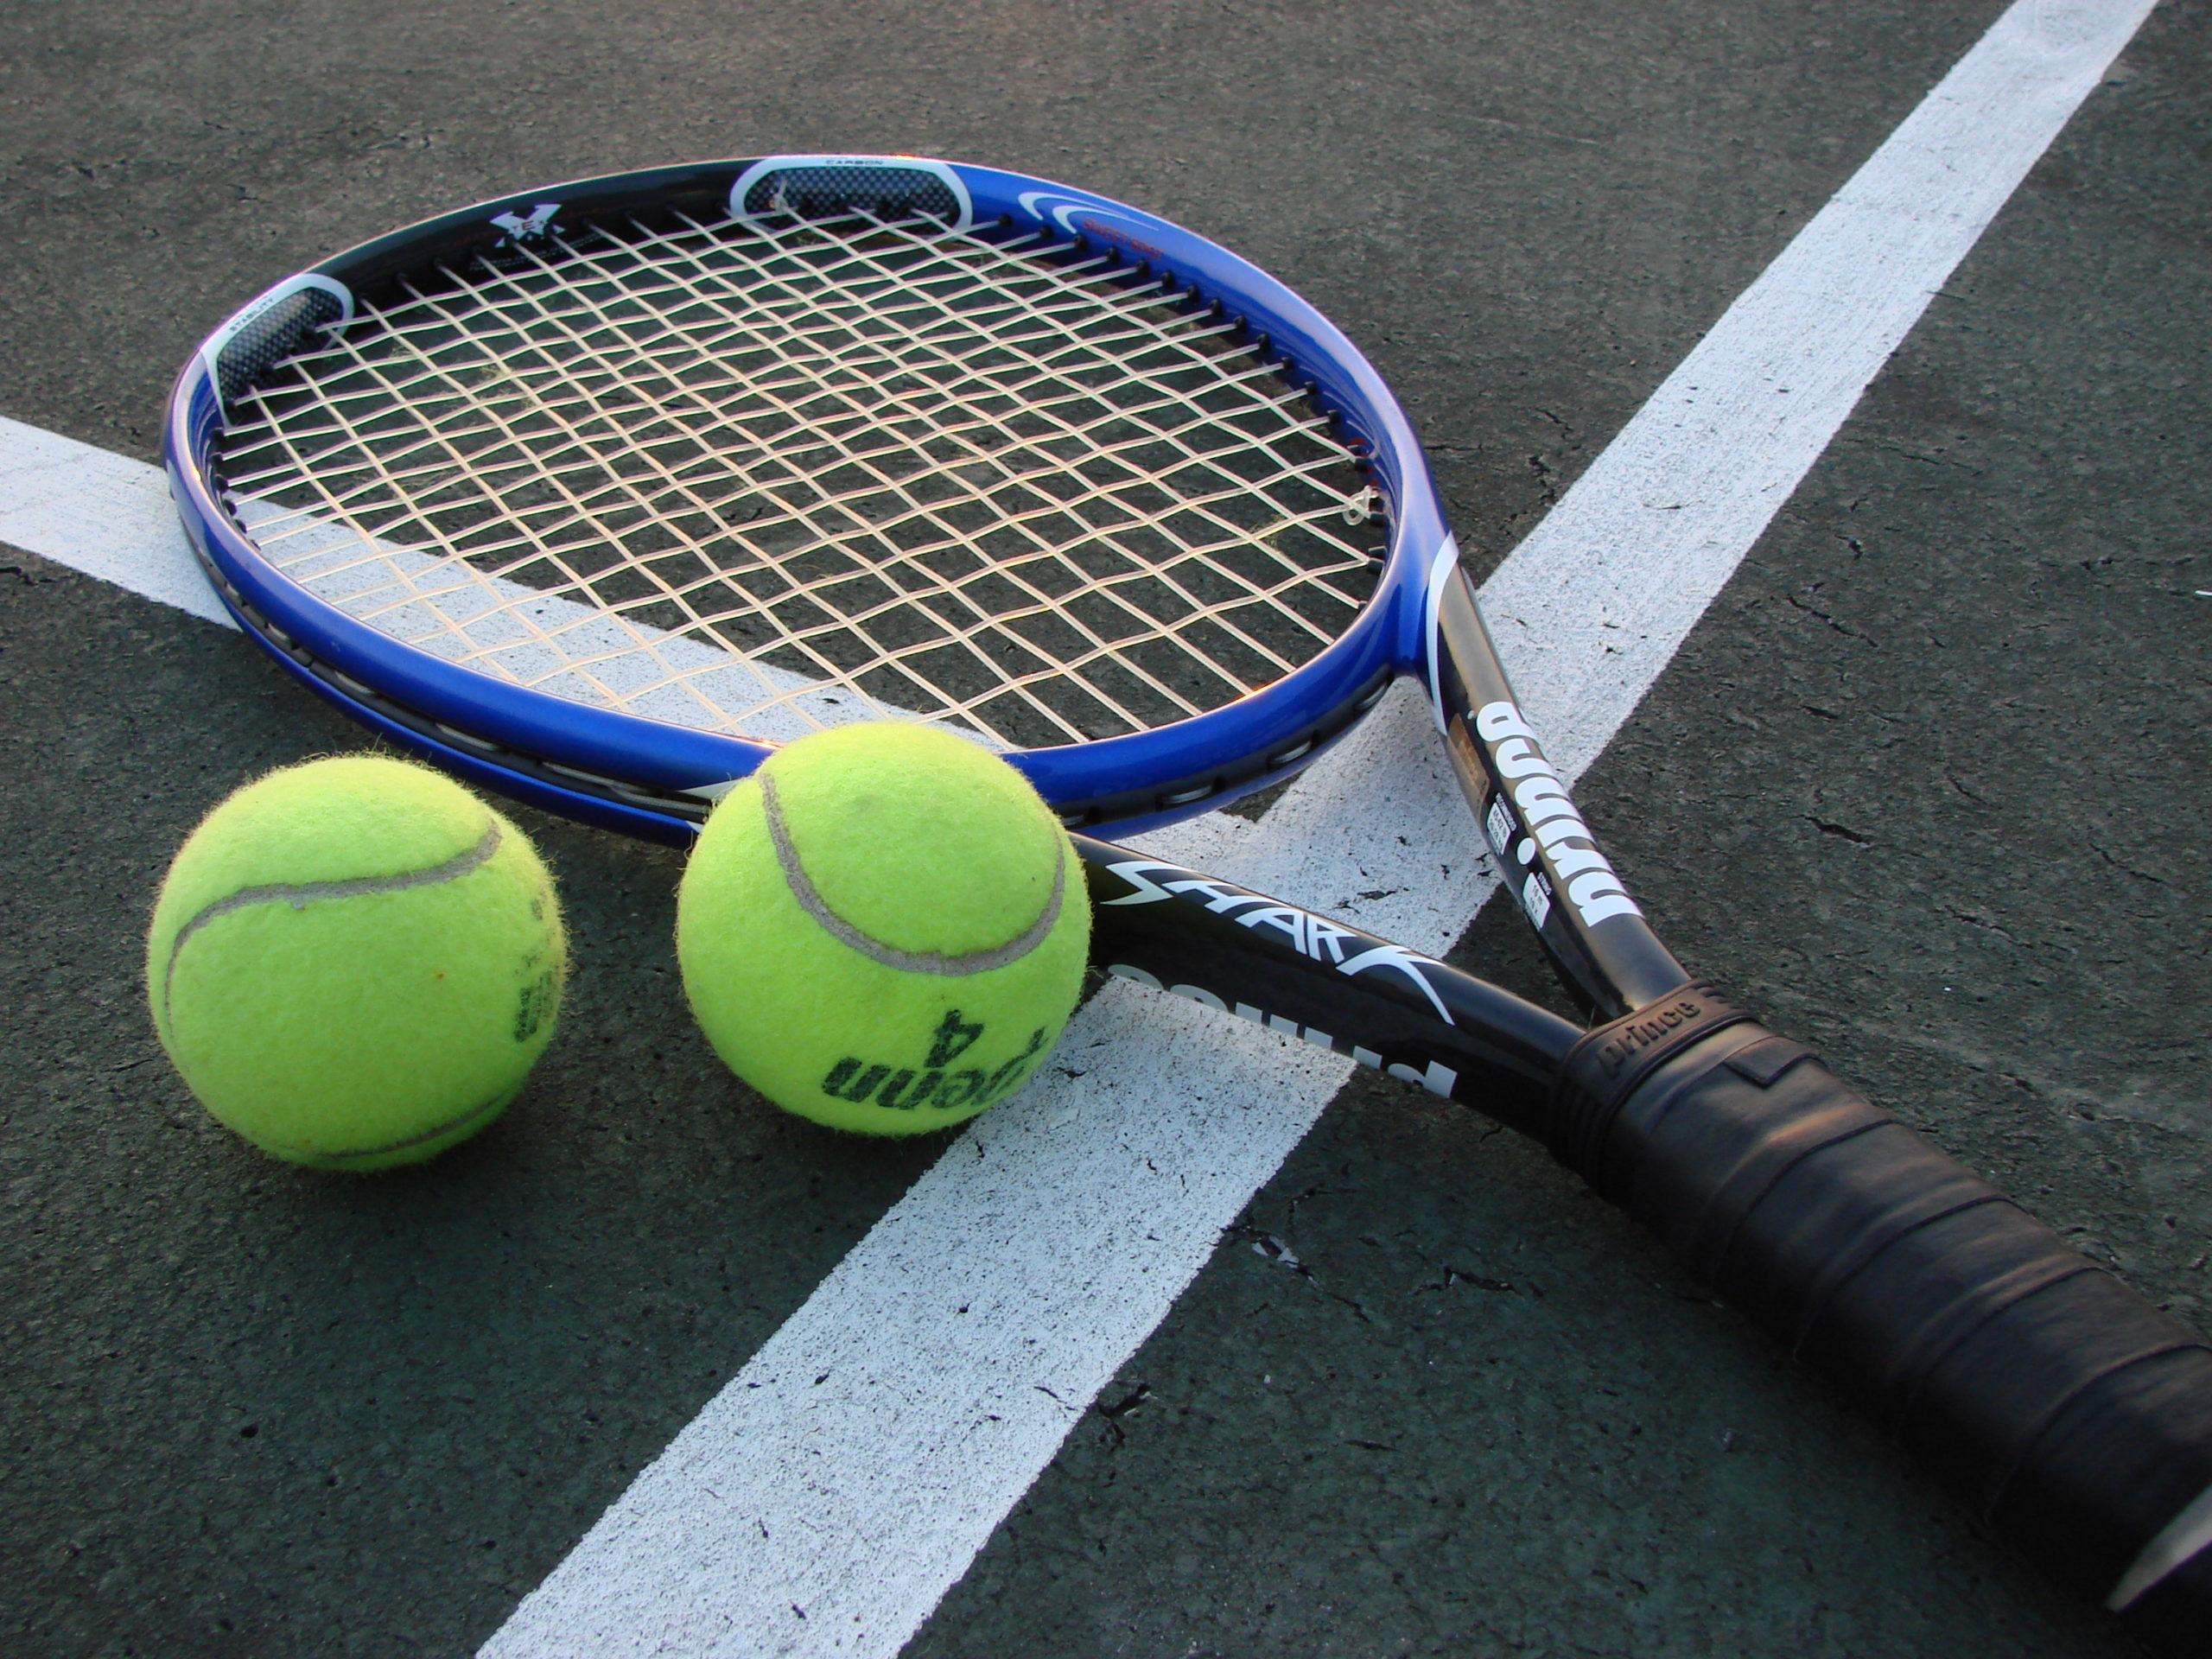 ITF retira placar ao vivo dos futures para inibir apostas